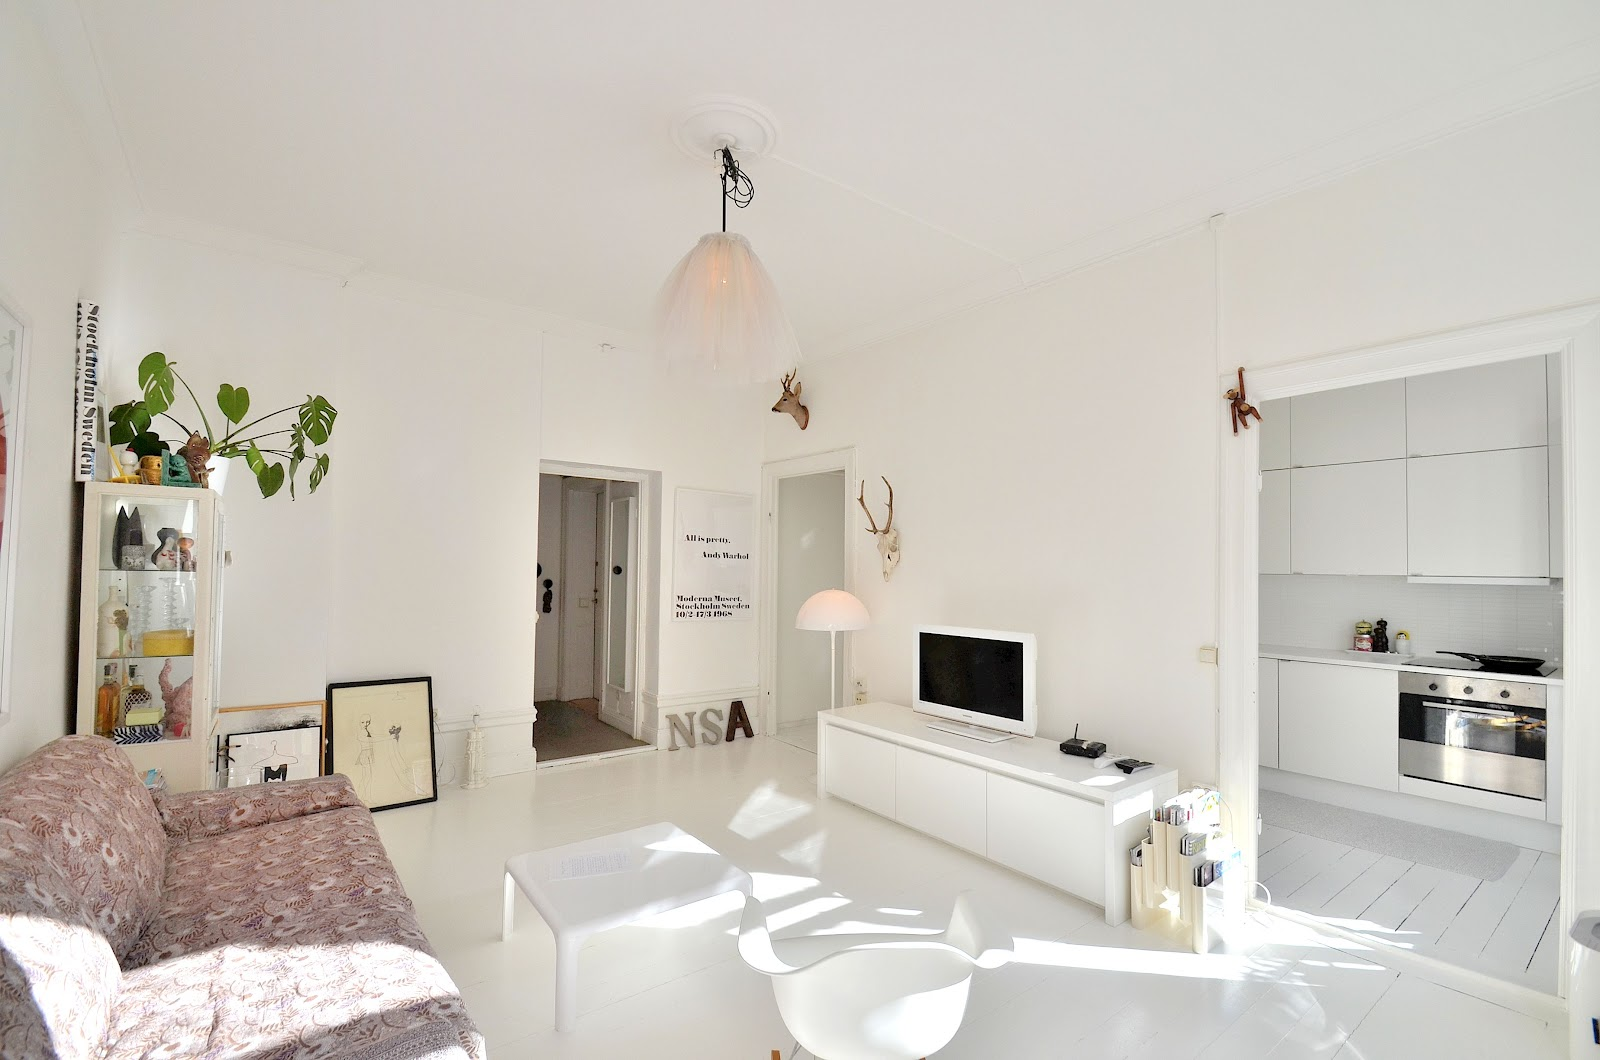 City Living Apt Blog: Scoop - Swedish design apt rental in ...